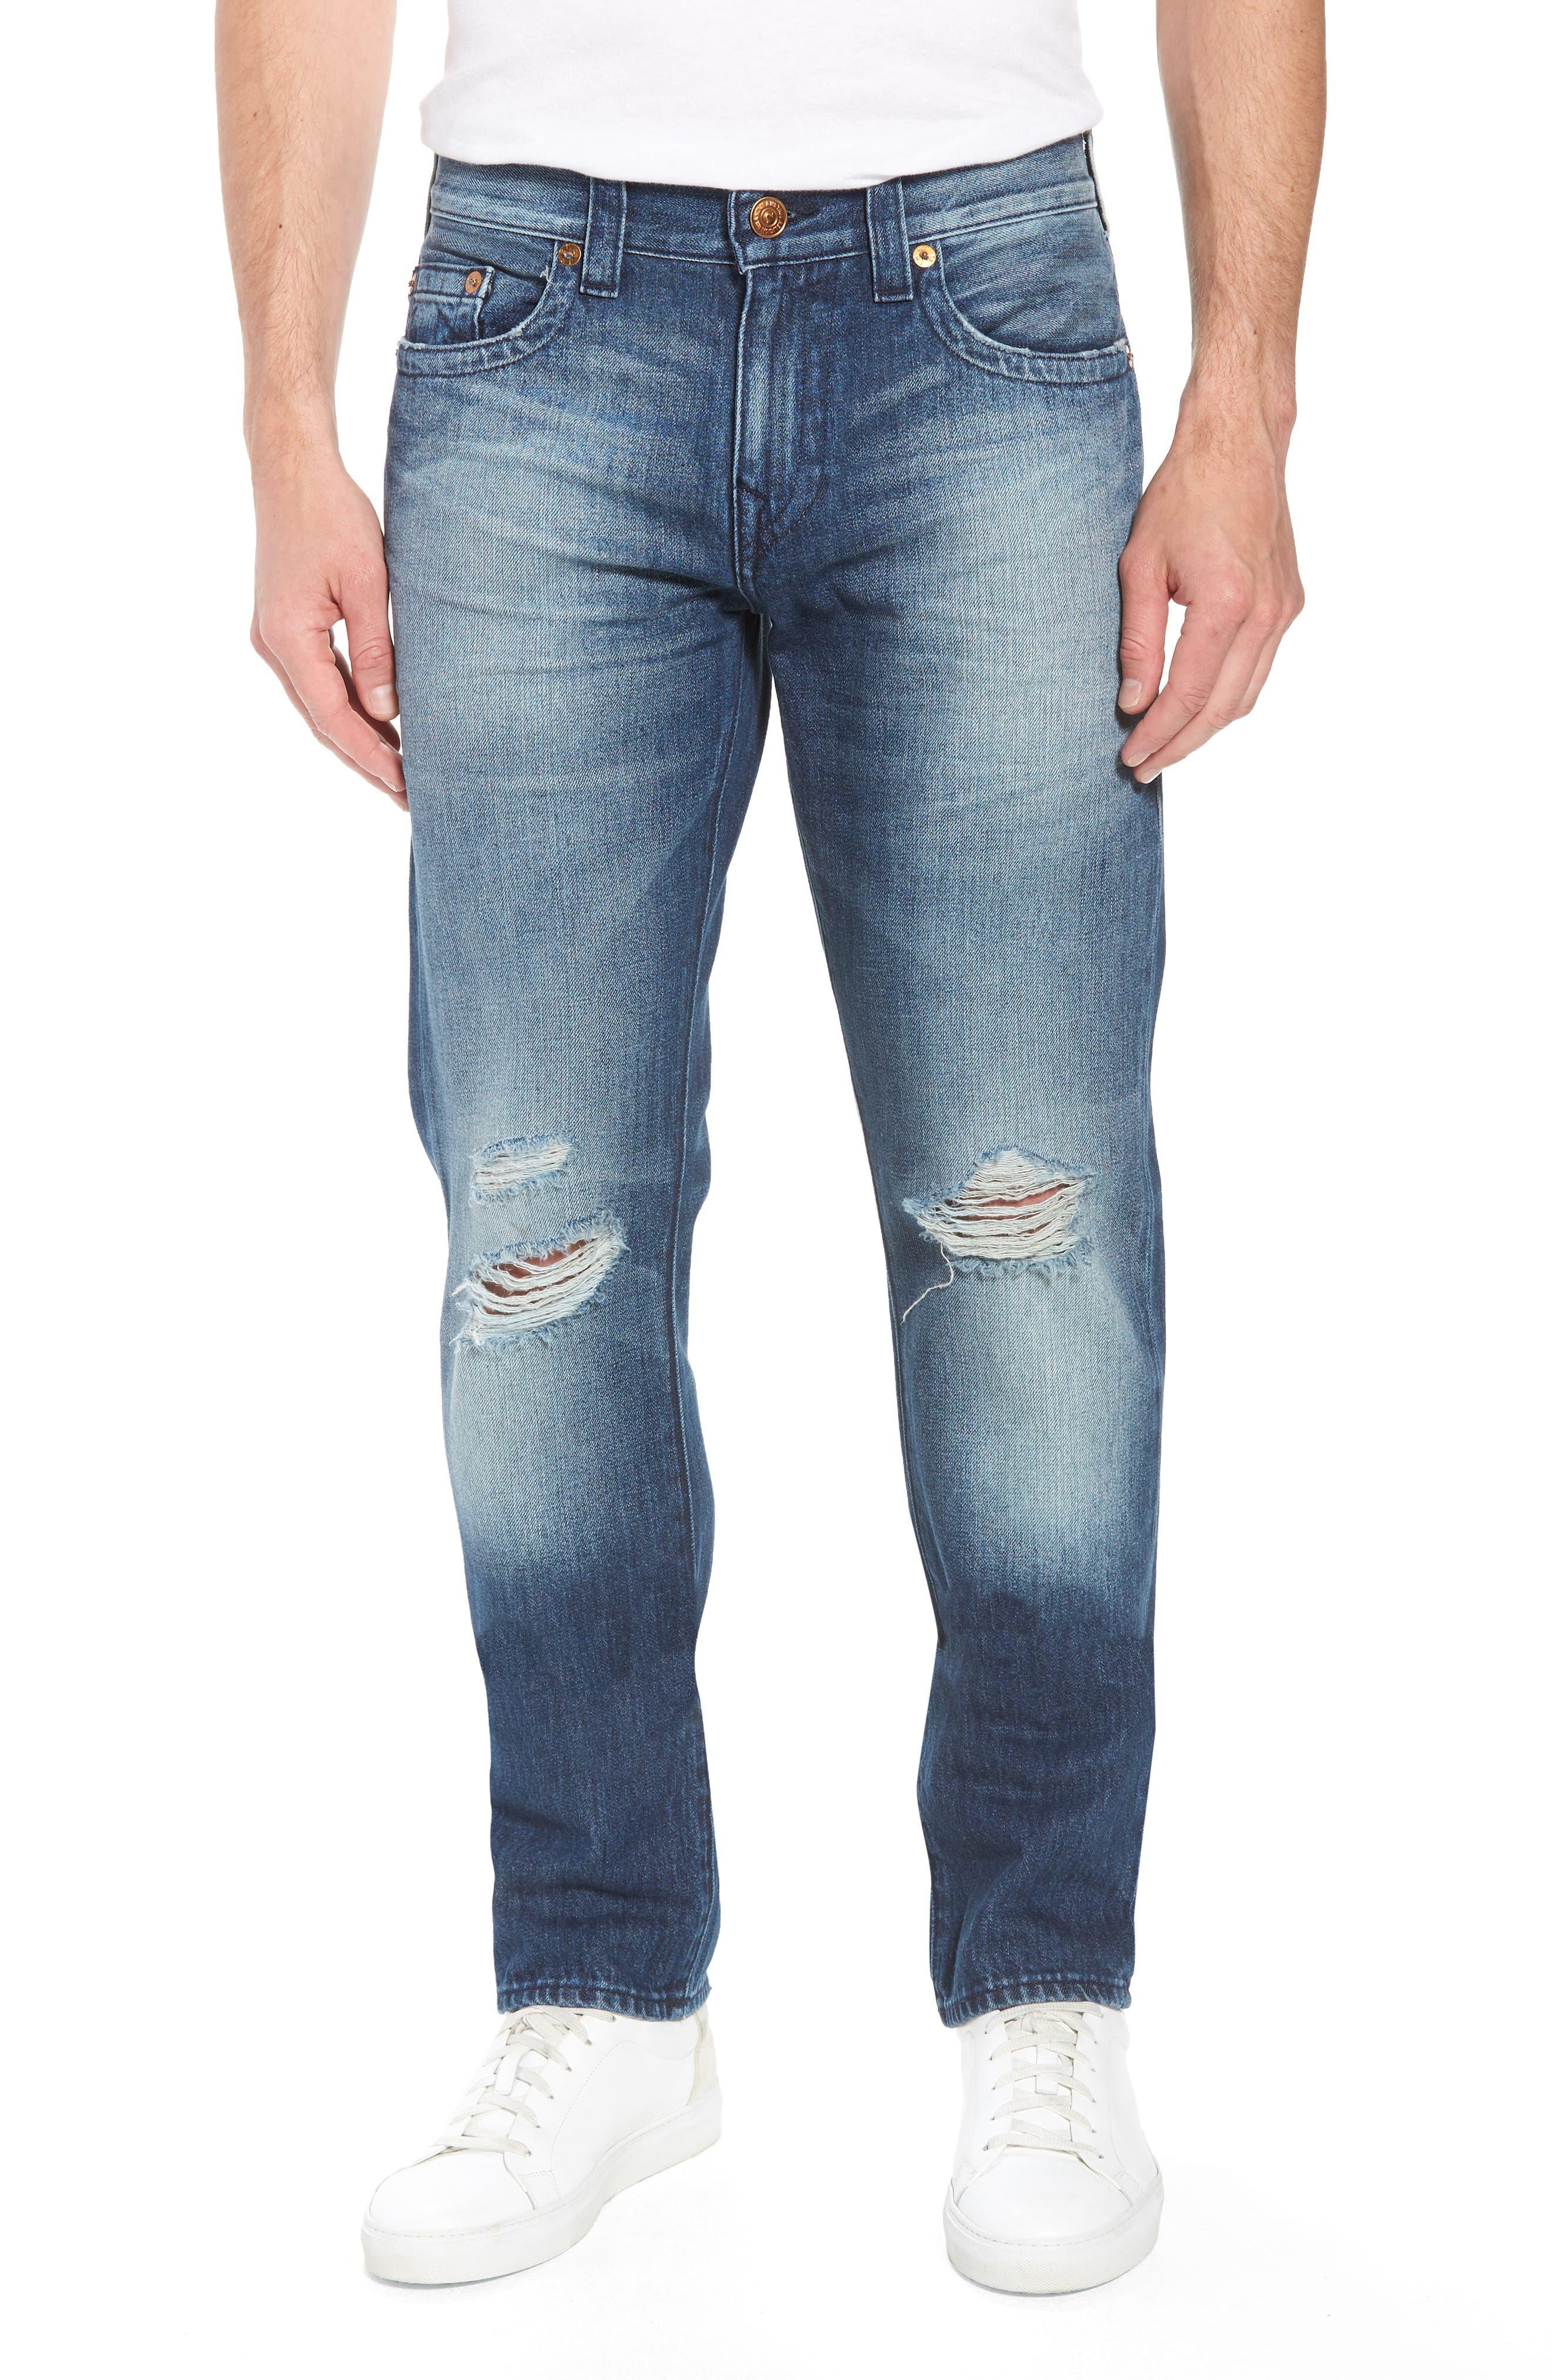 Geno Straight Leg Jeans,                         Main,                         color, WORN SUSPECT